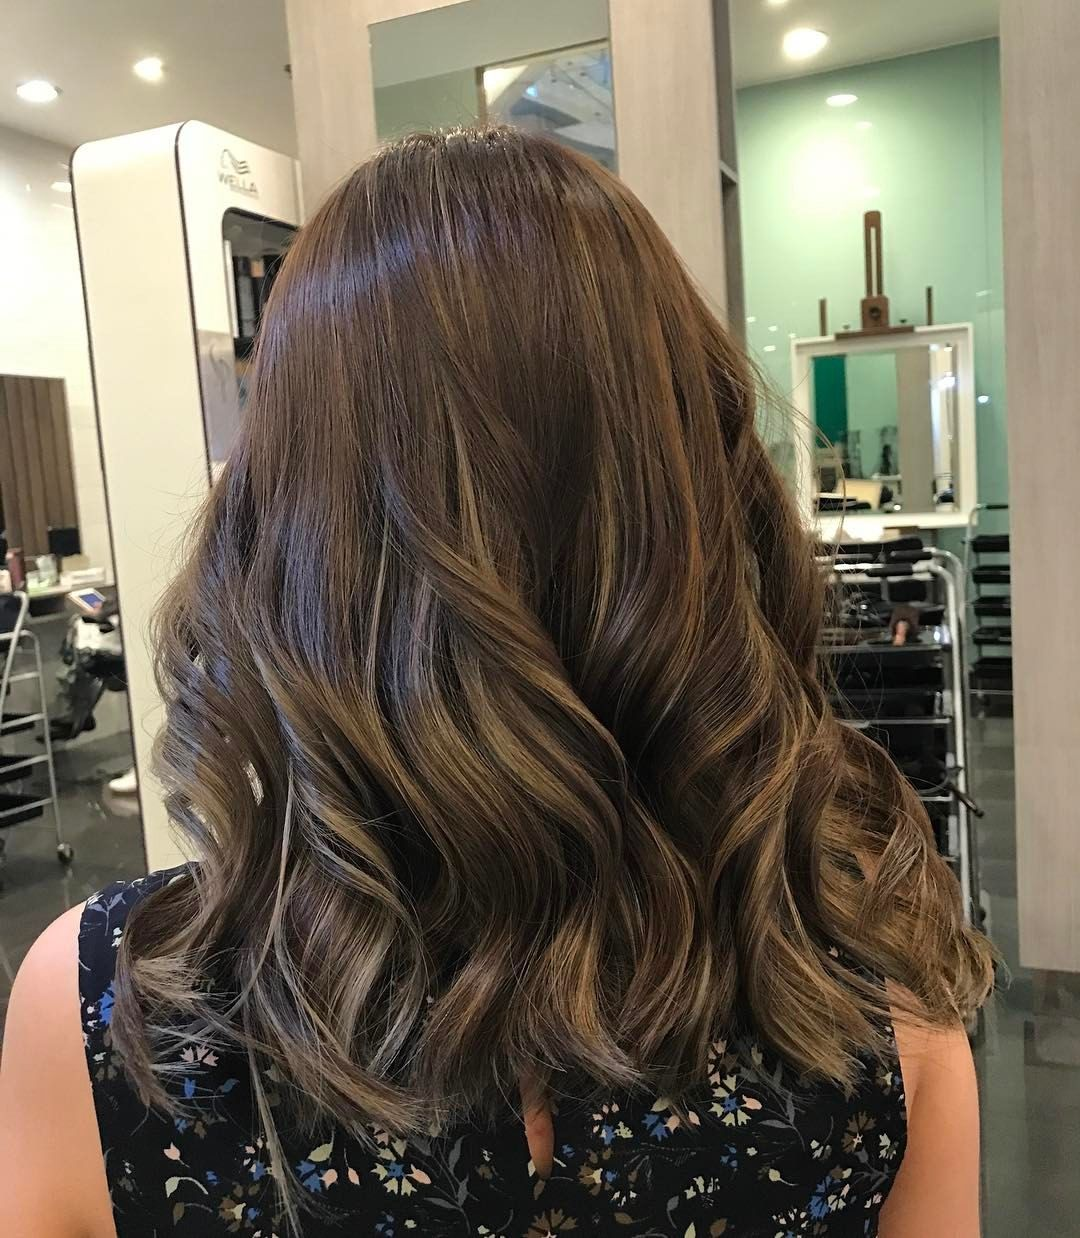 Pin on Haircuts & haircare